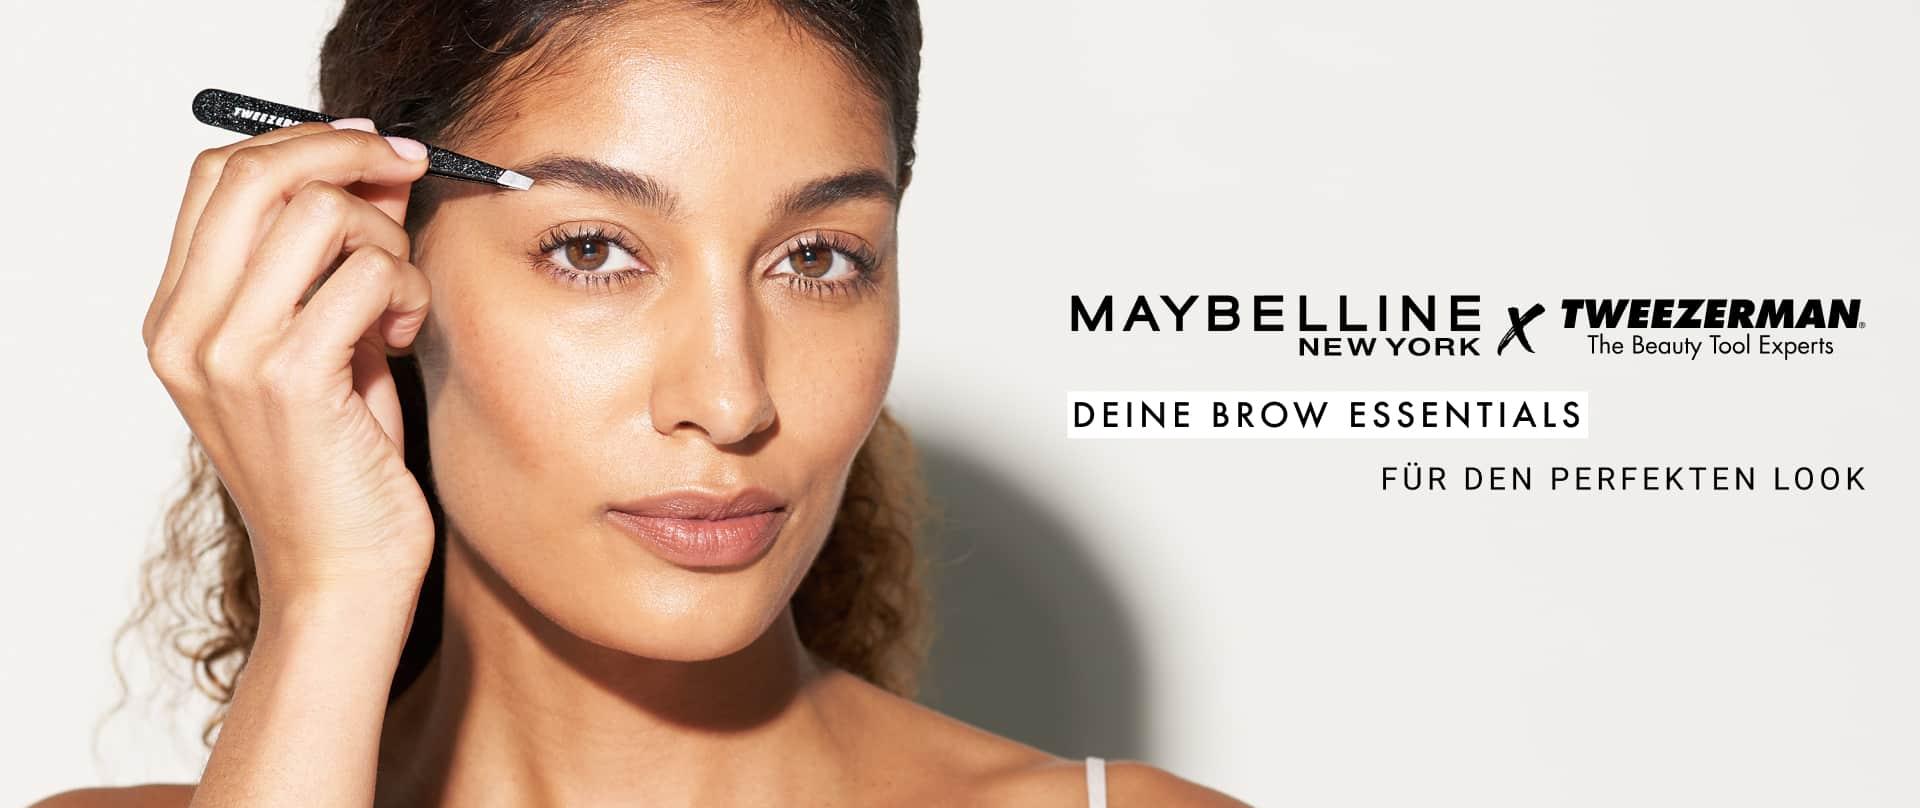 Maybelline x Tweezerman Banner